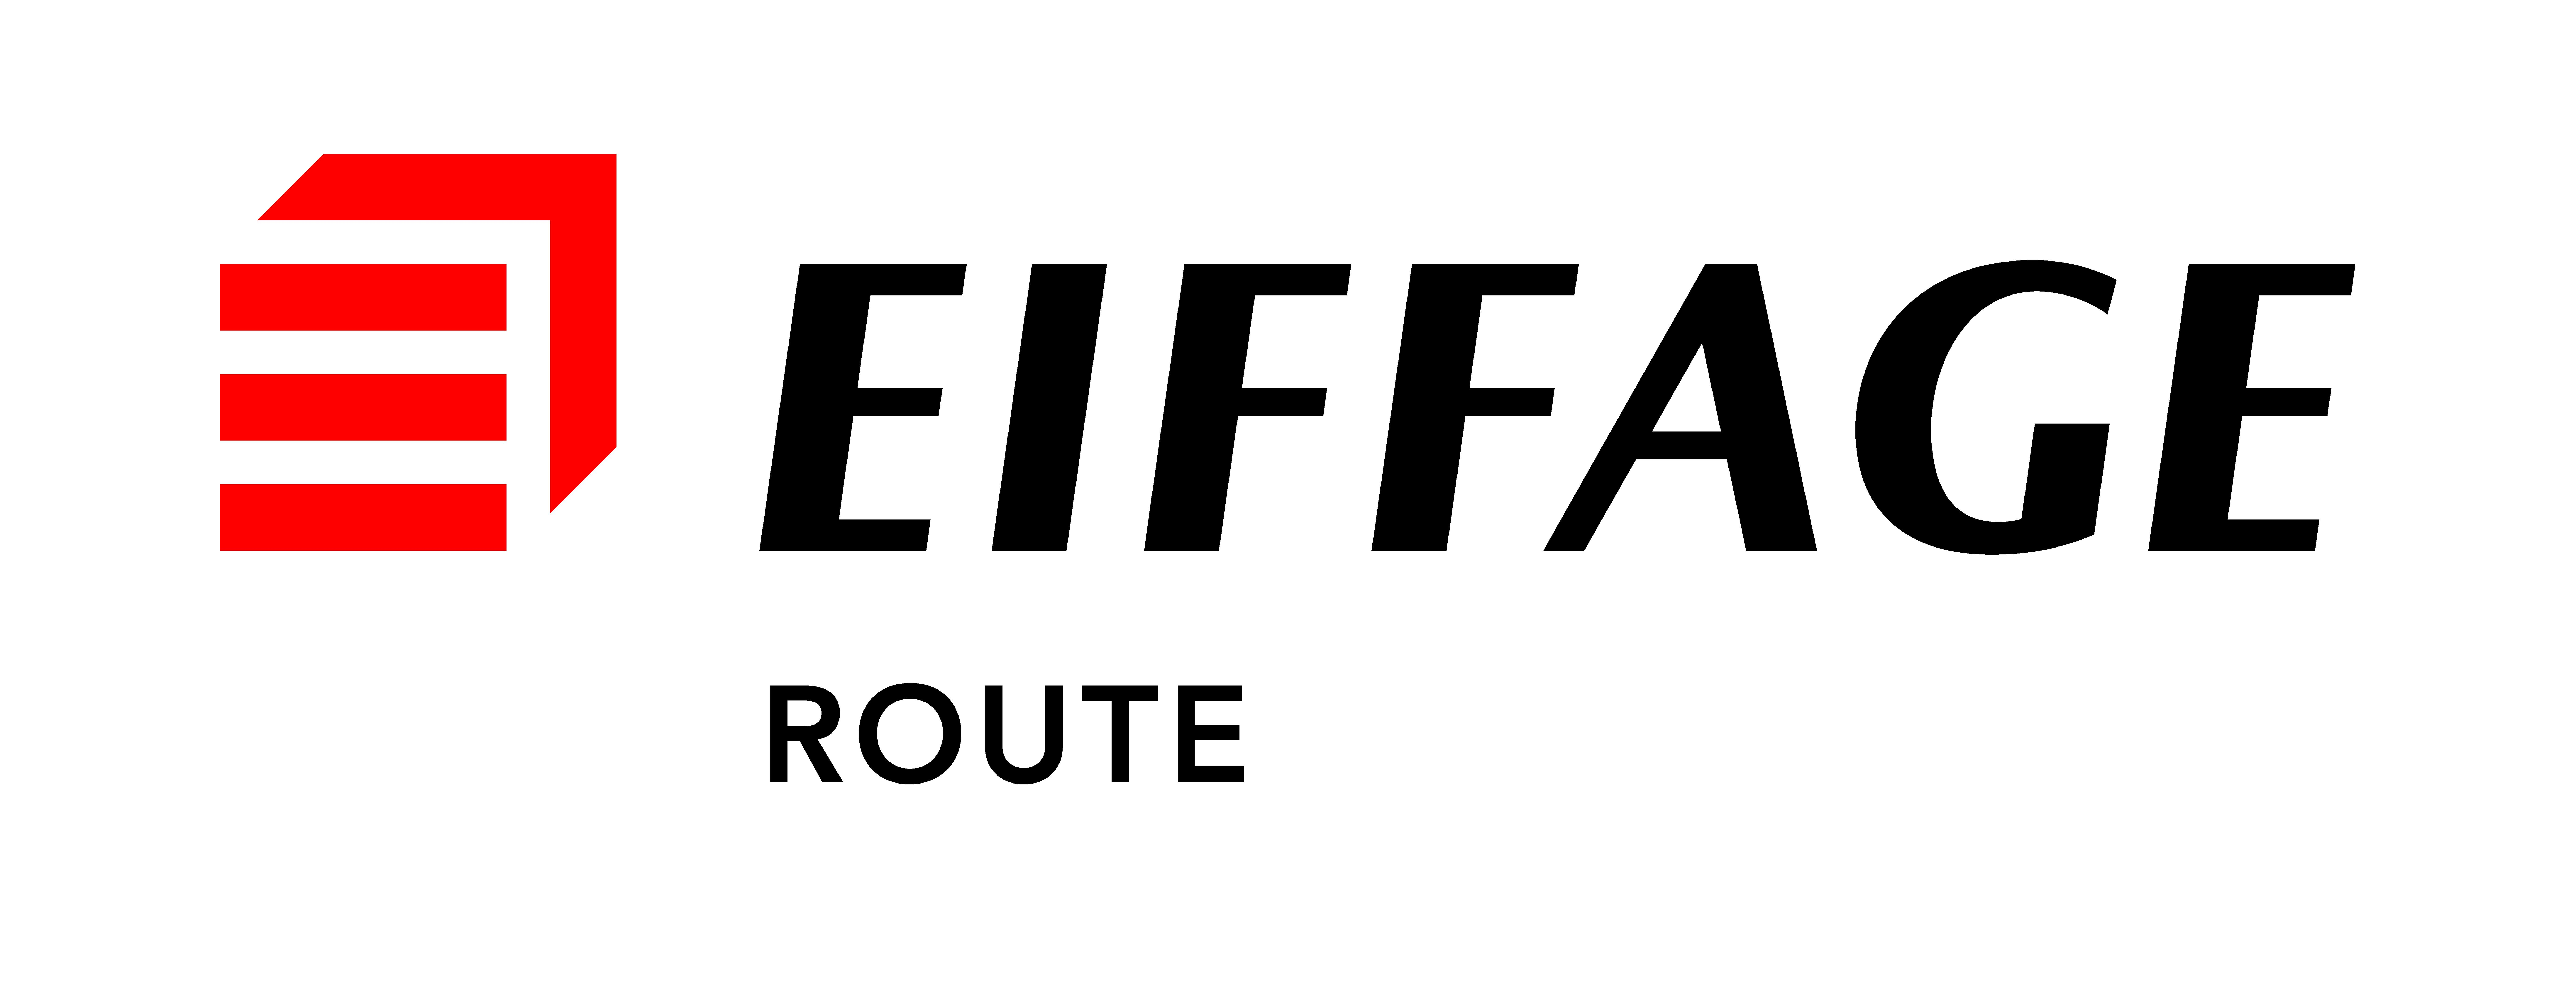 Eiffage_Route_01_2400_colour_RGB